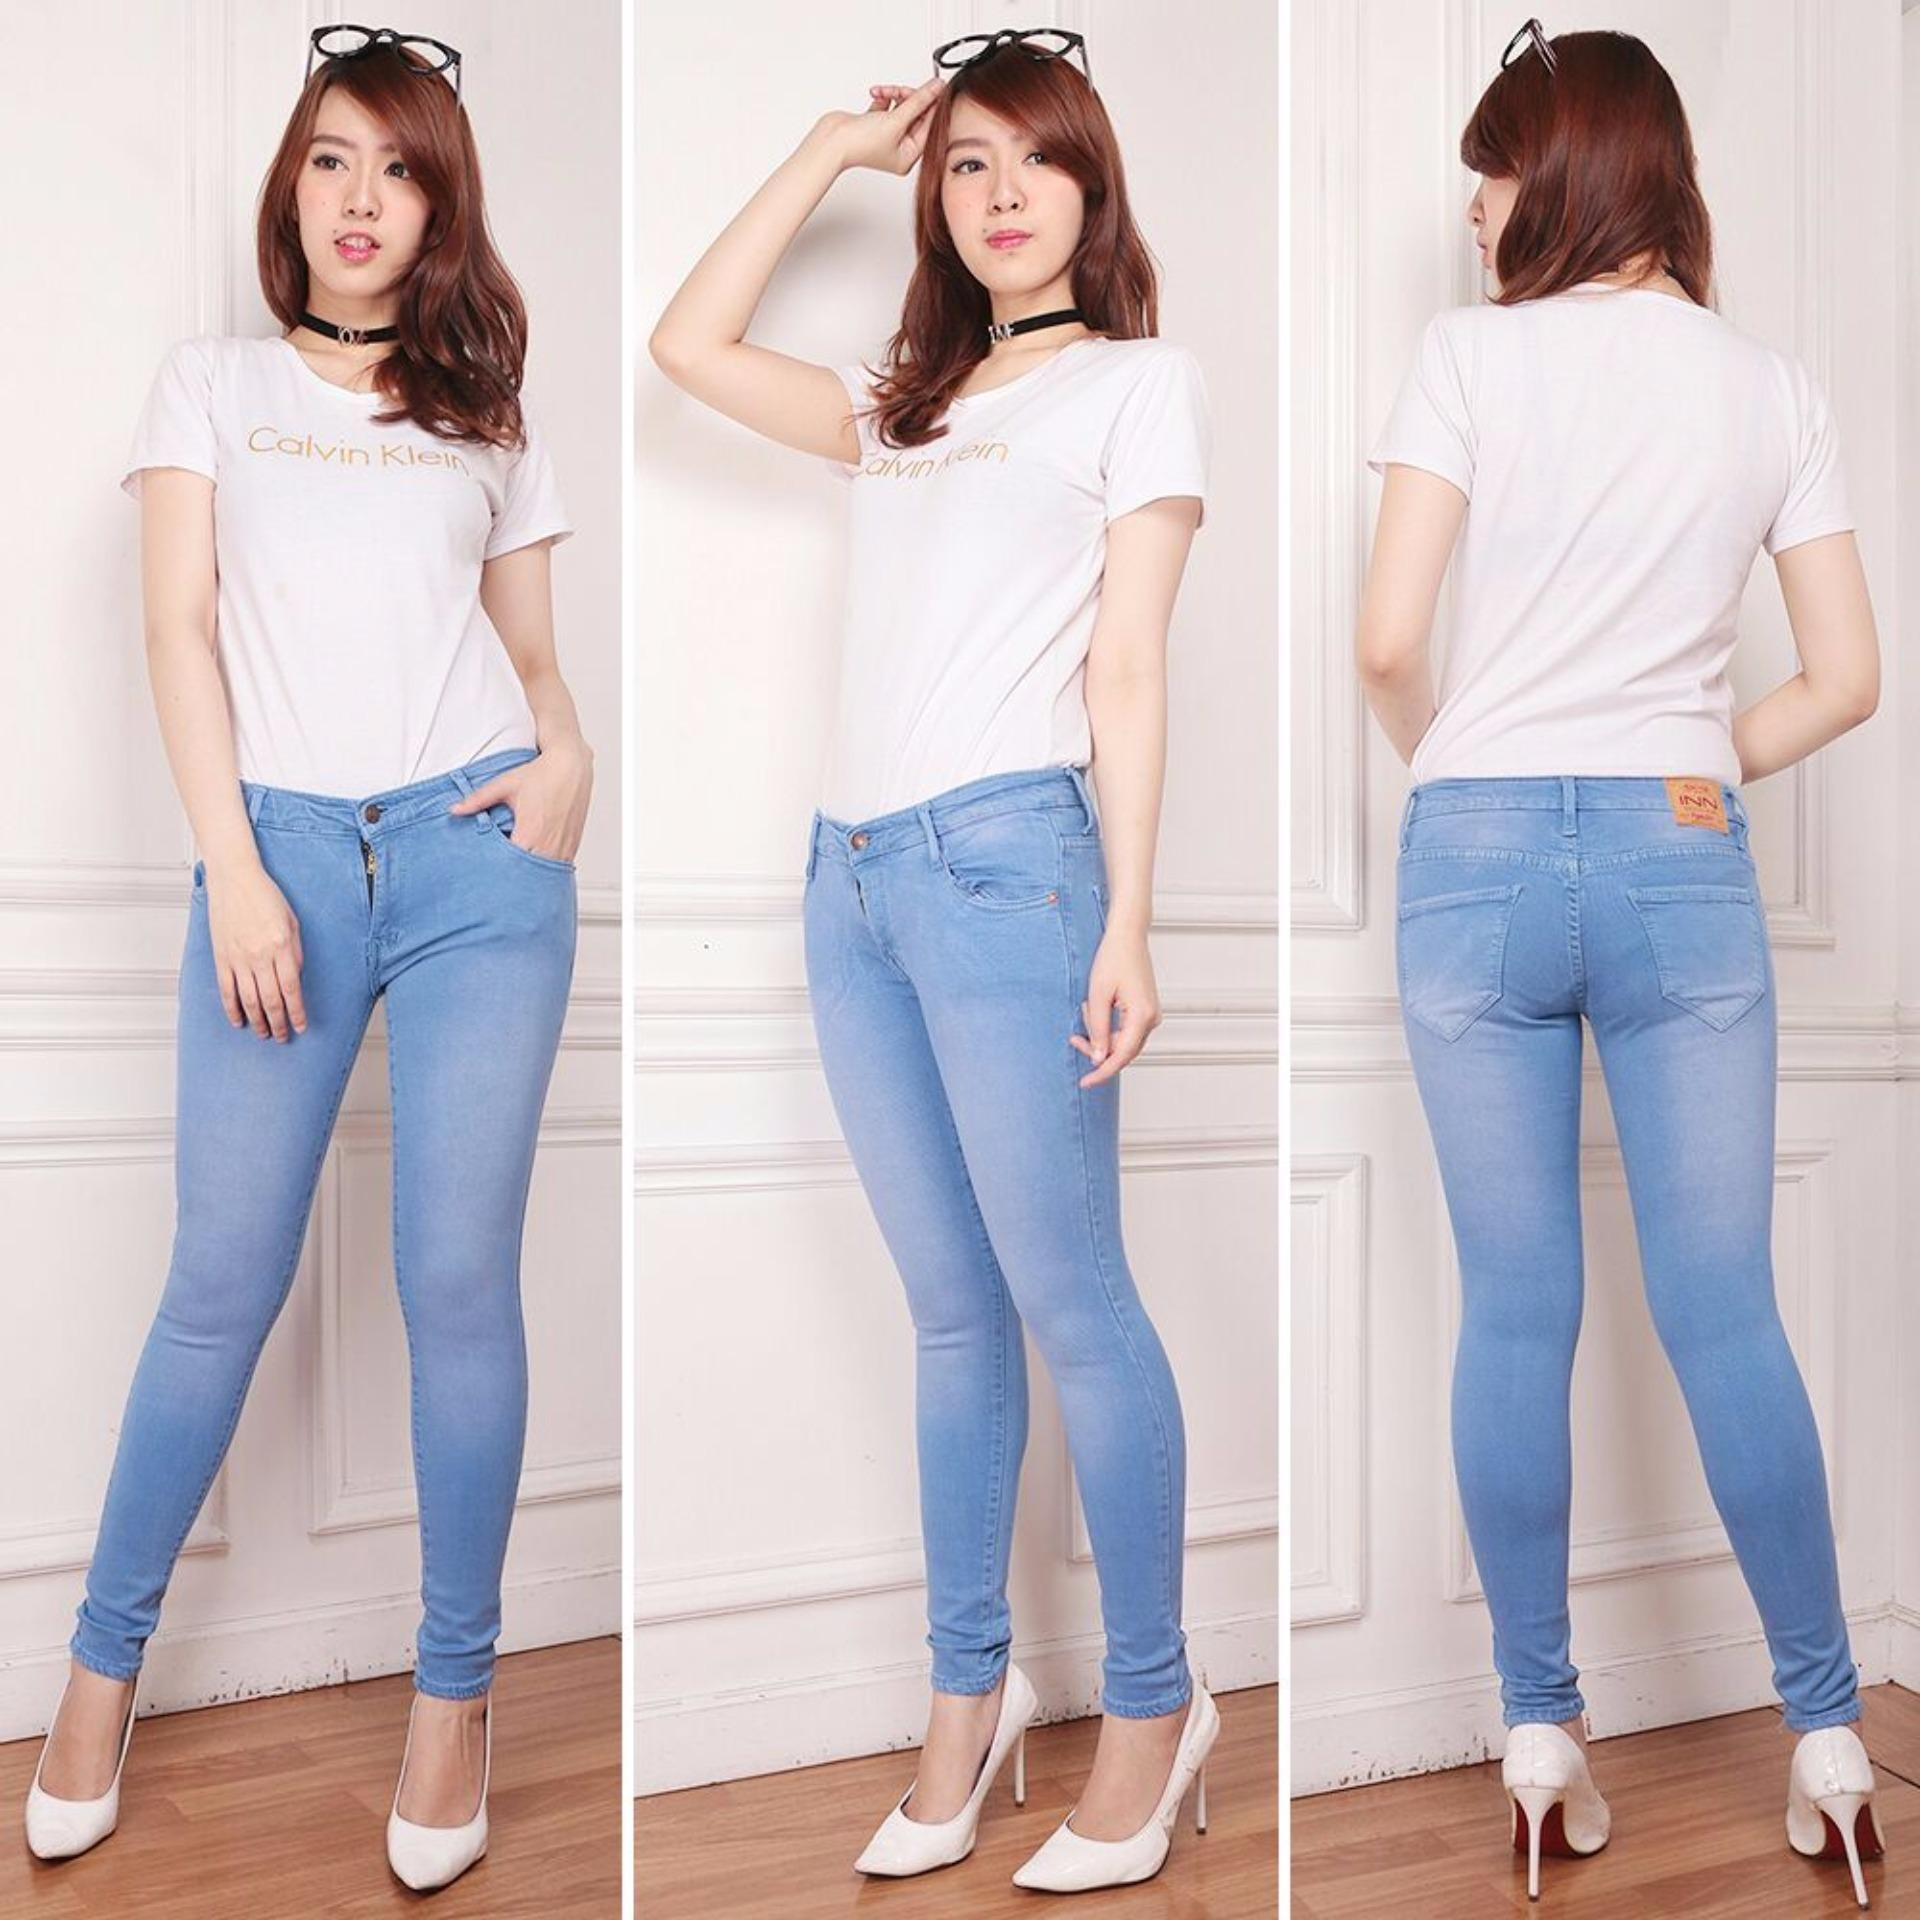 Katalog Nusantara Jeans Celana Panjang Wanita Model Skinny Street Berbahan Denim Bagus Jahitan Rapi Murah Ice Blue Terbaru